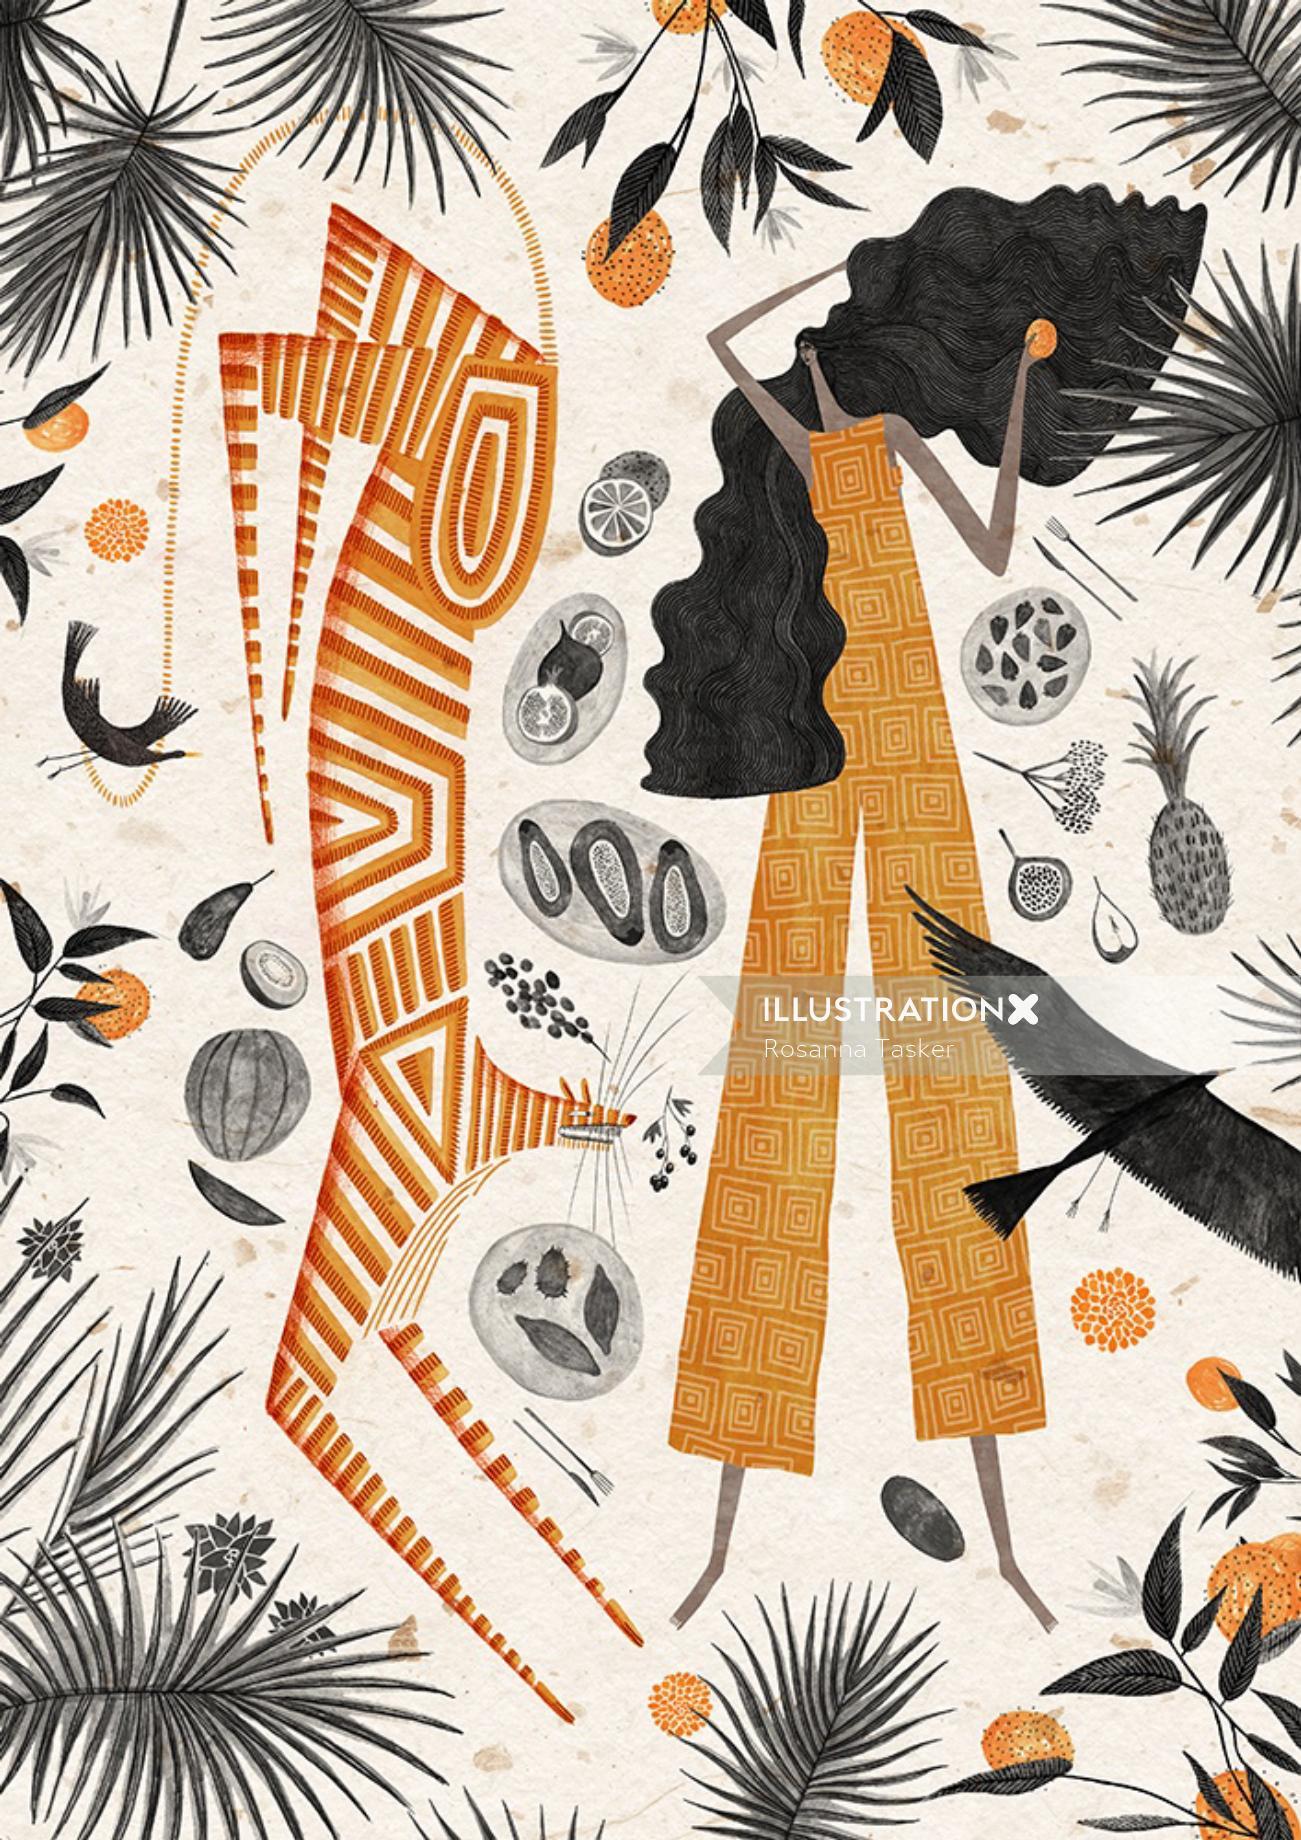 Illustration for Folklore Exhibition